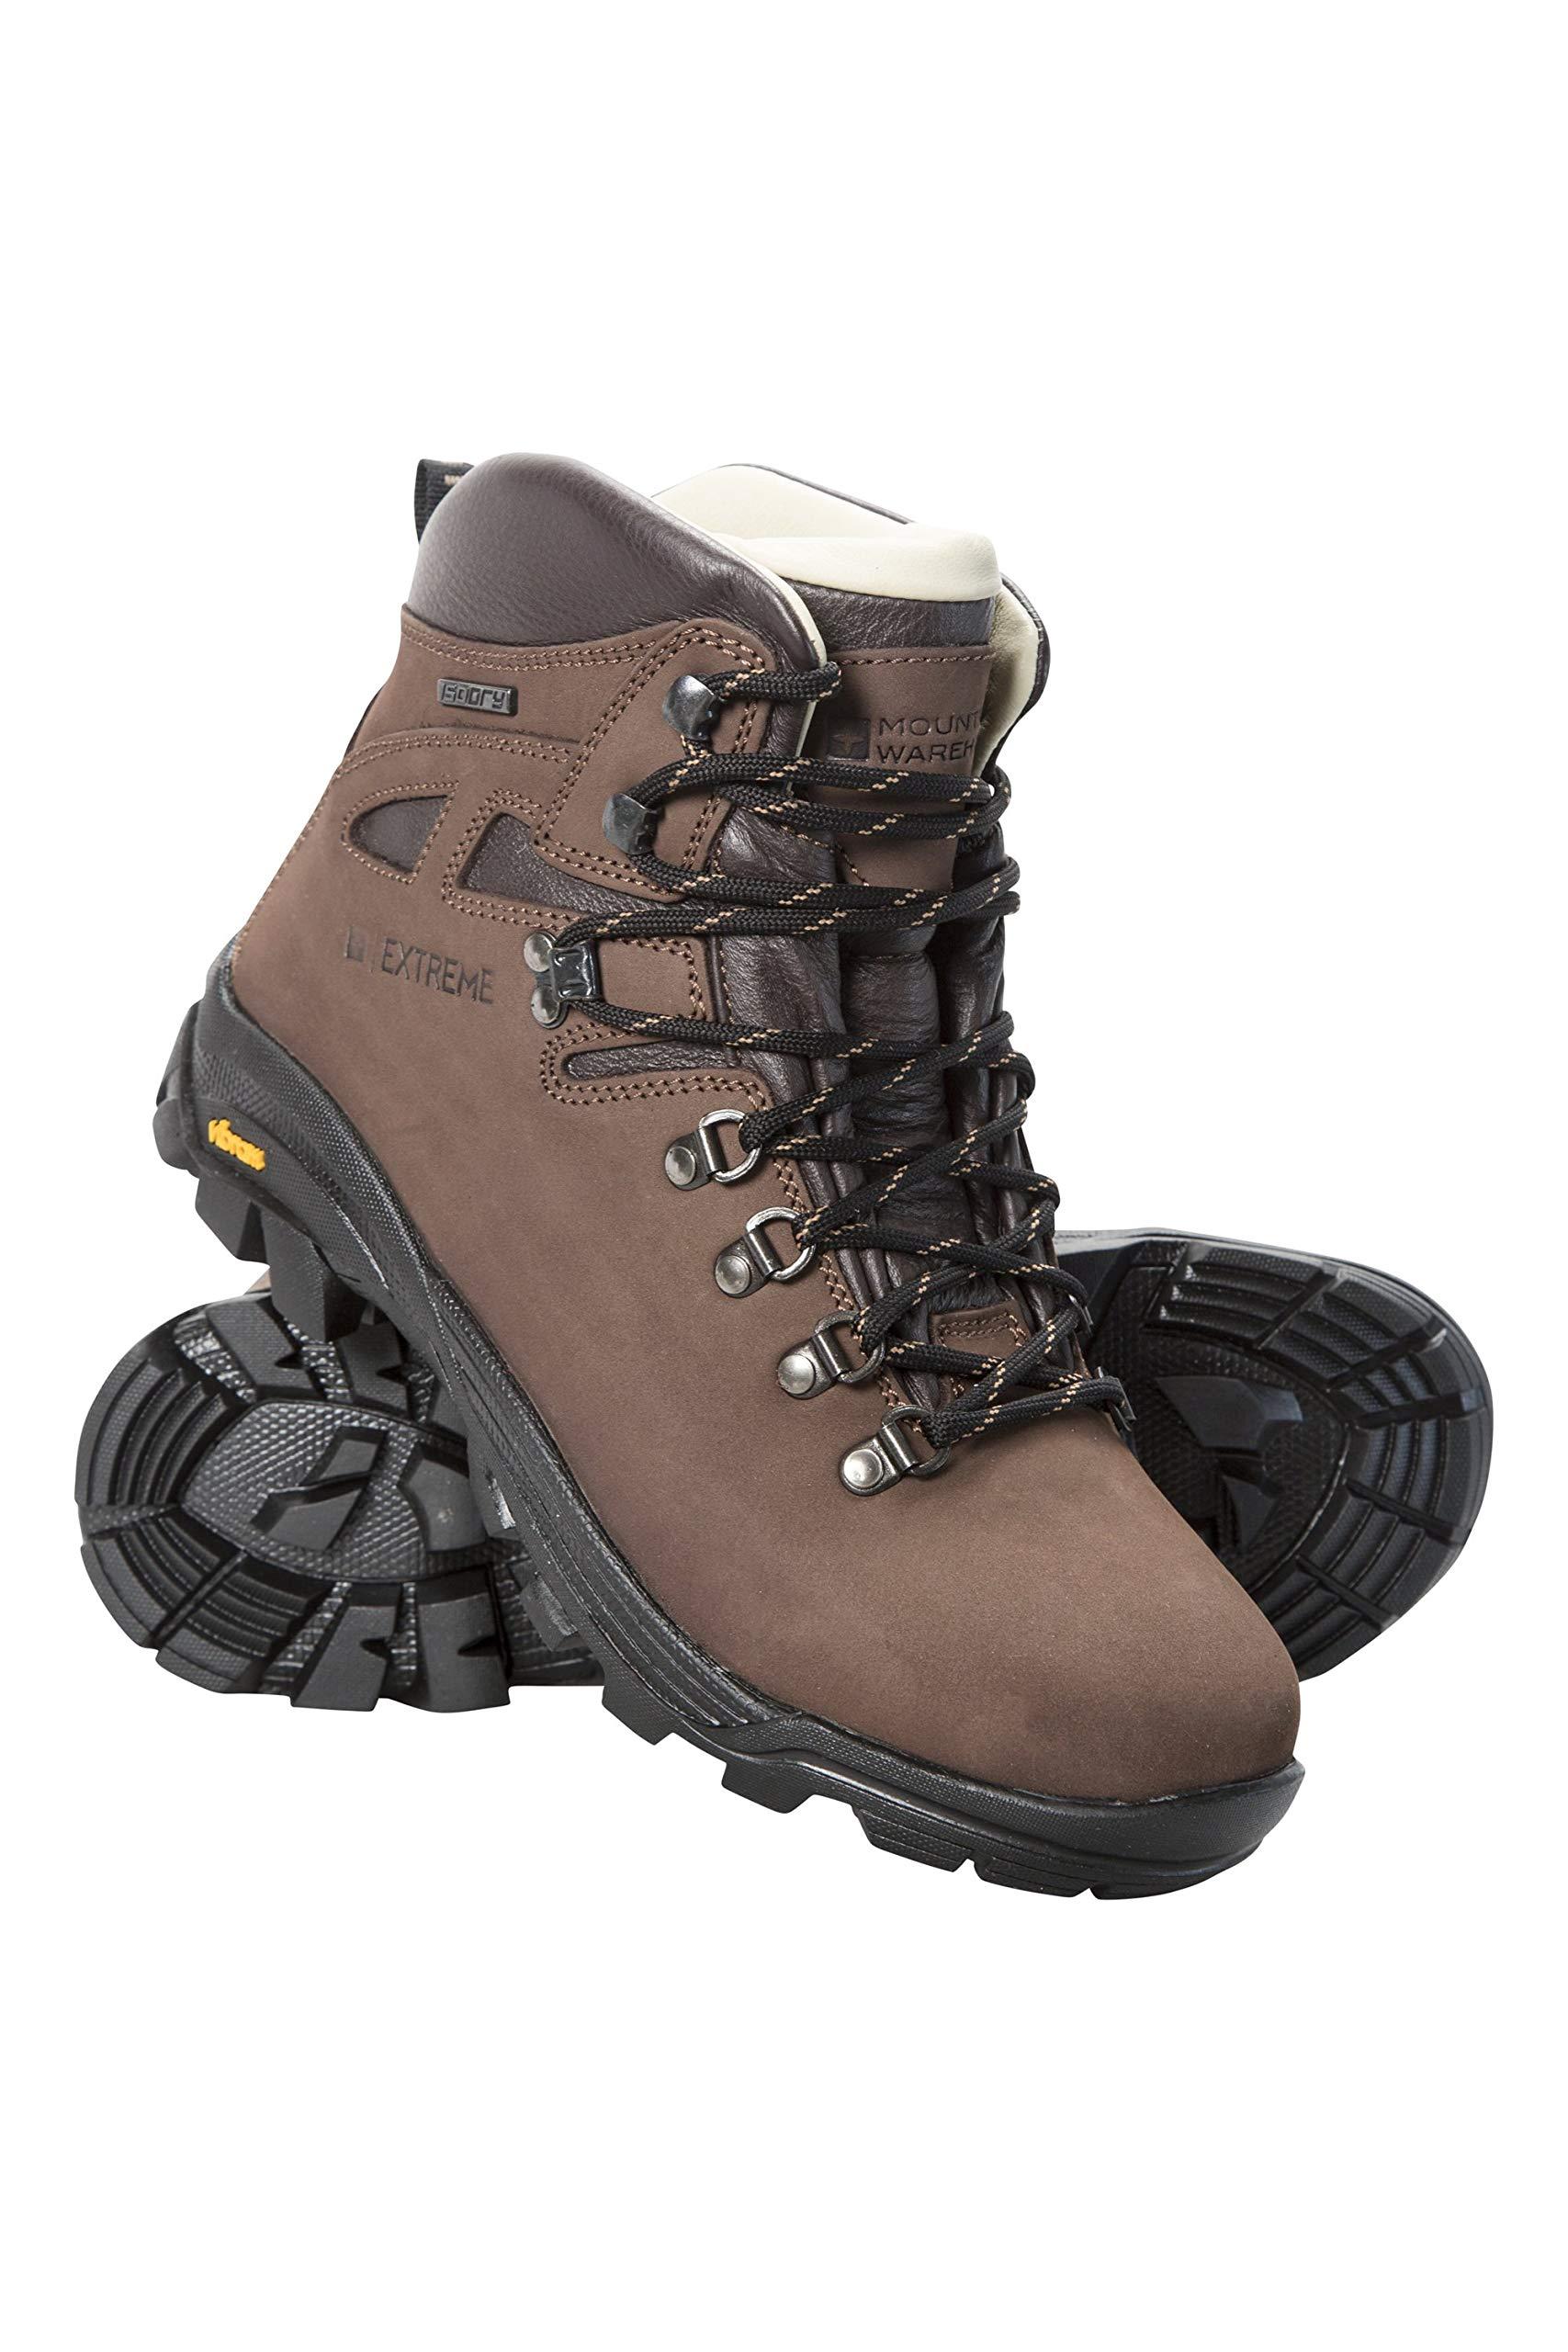 Mountain Warehouse Excalibur Womens Hiking Boots -Vibram Walking Shoe